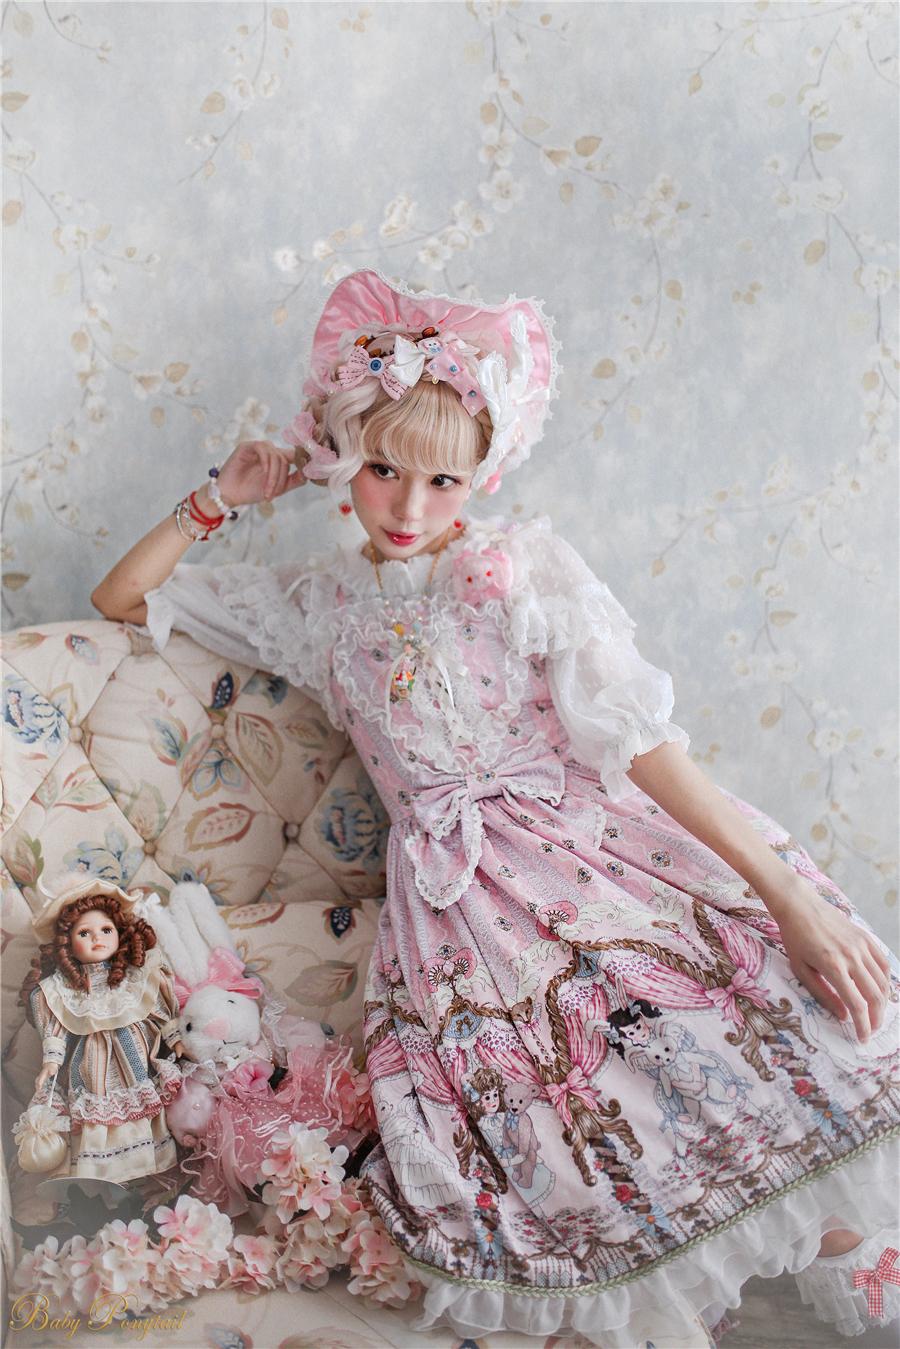 BabyPonytail_Model Photo_My Favorite Companion_JSK Pink_Kaka_09.jpg